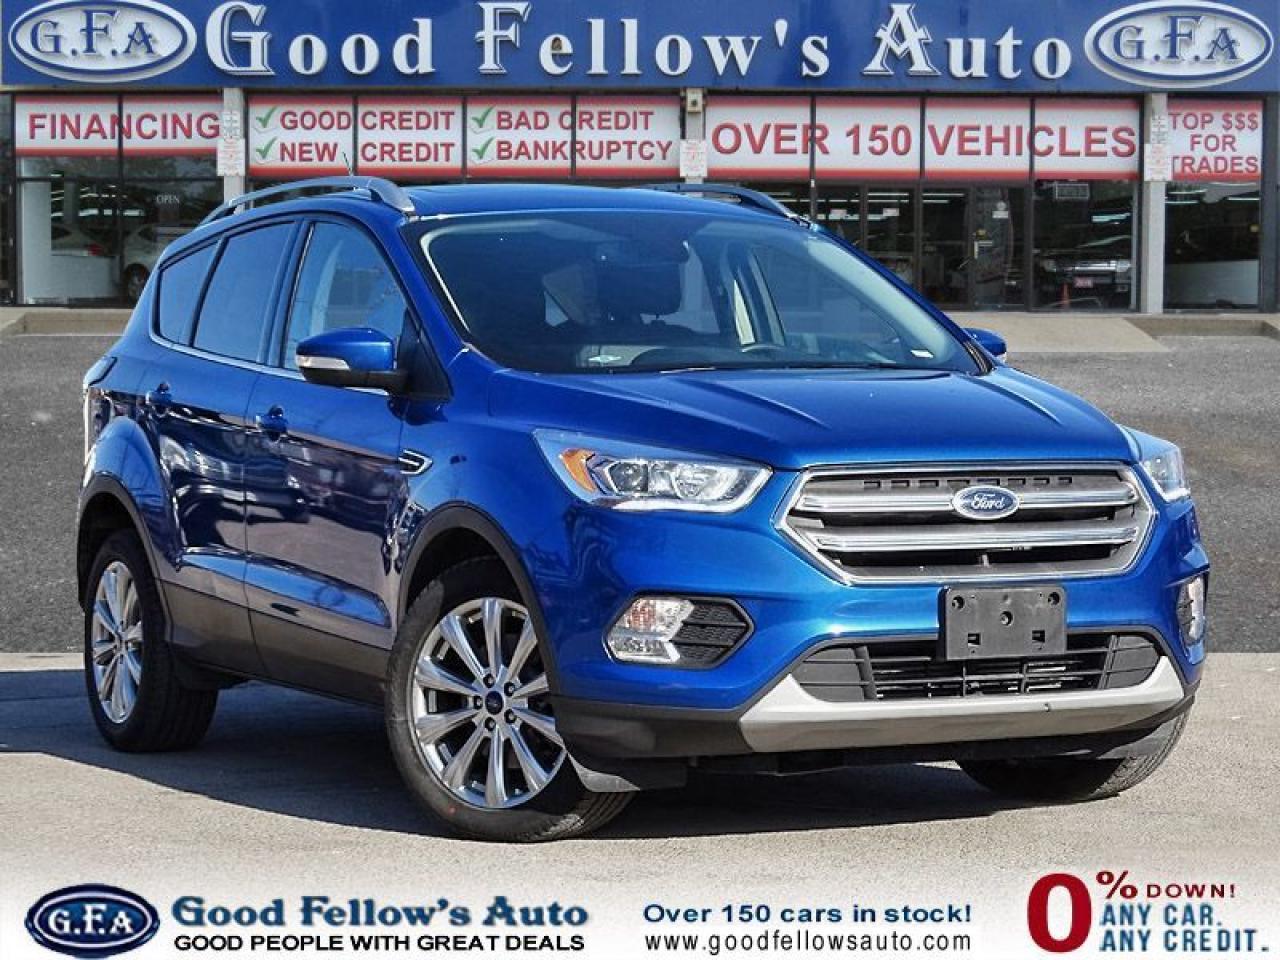 2017 Ford Escape TITANIUM, LEATHER SEATS, NAVIGATION, PANROOF, 4WD